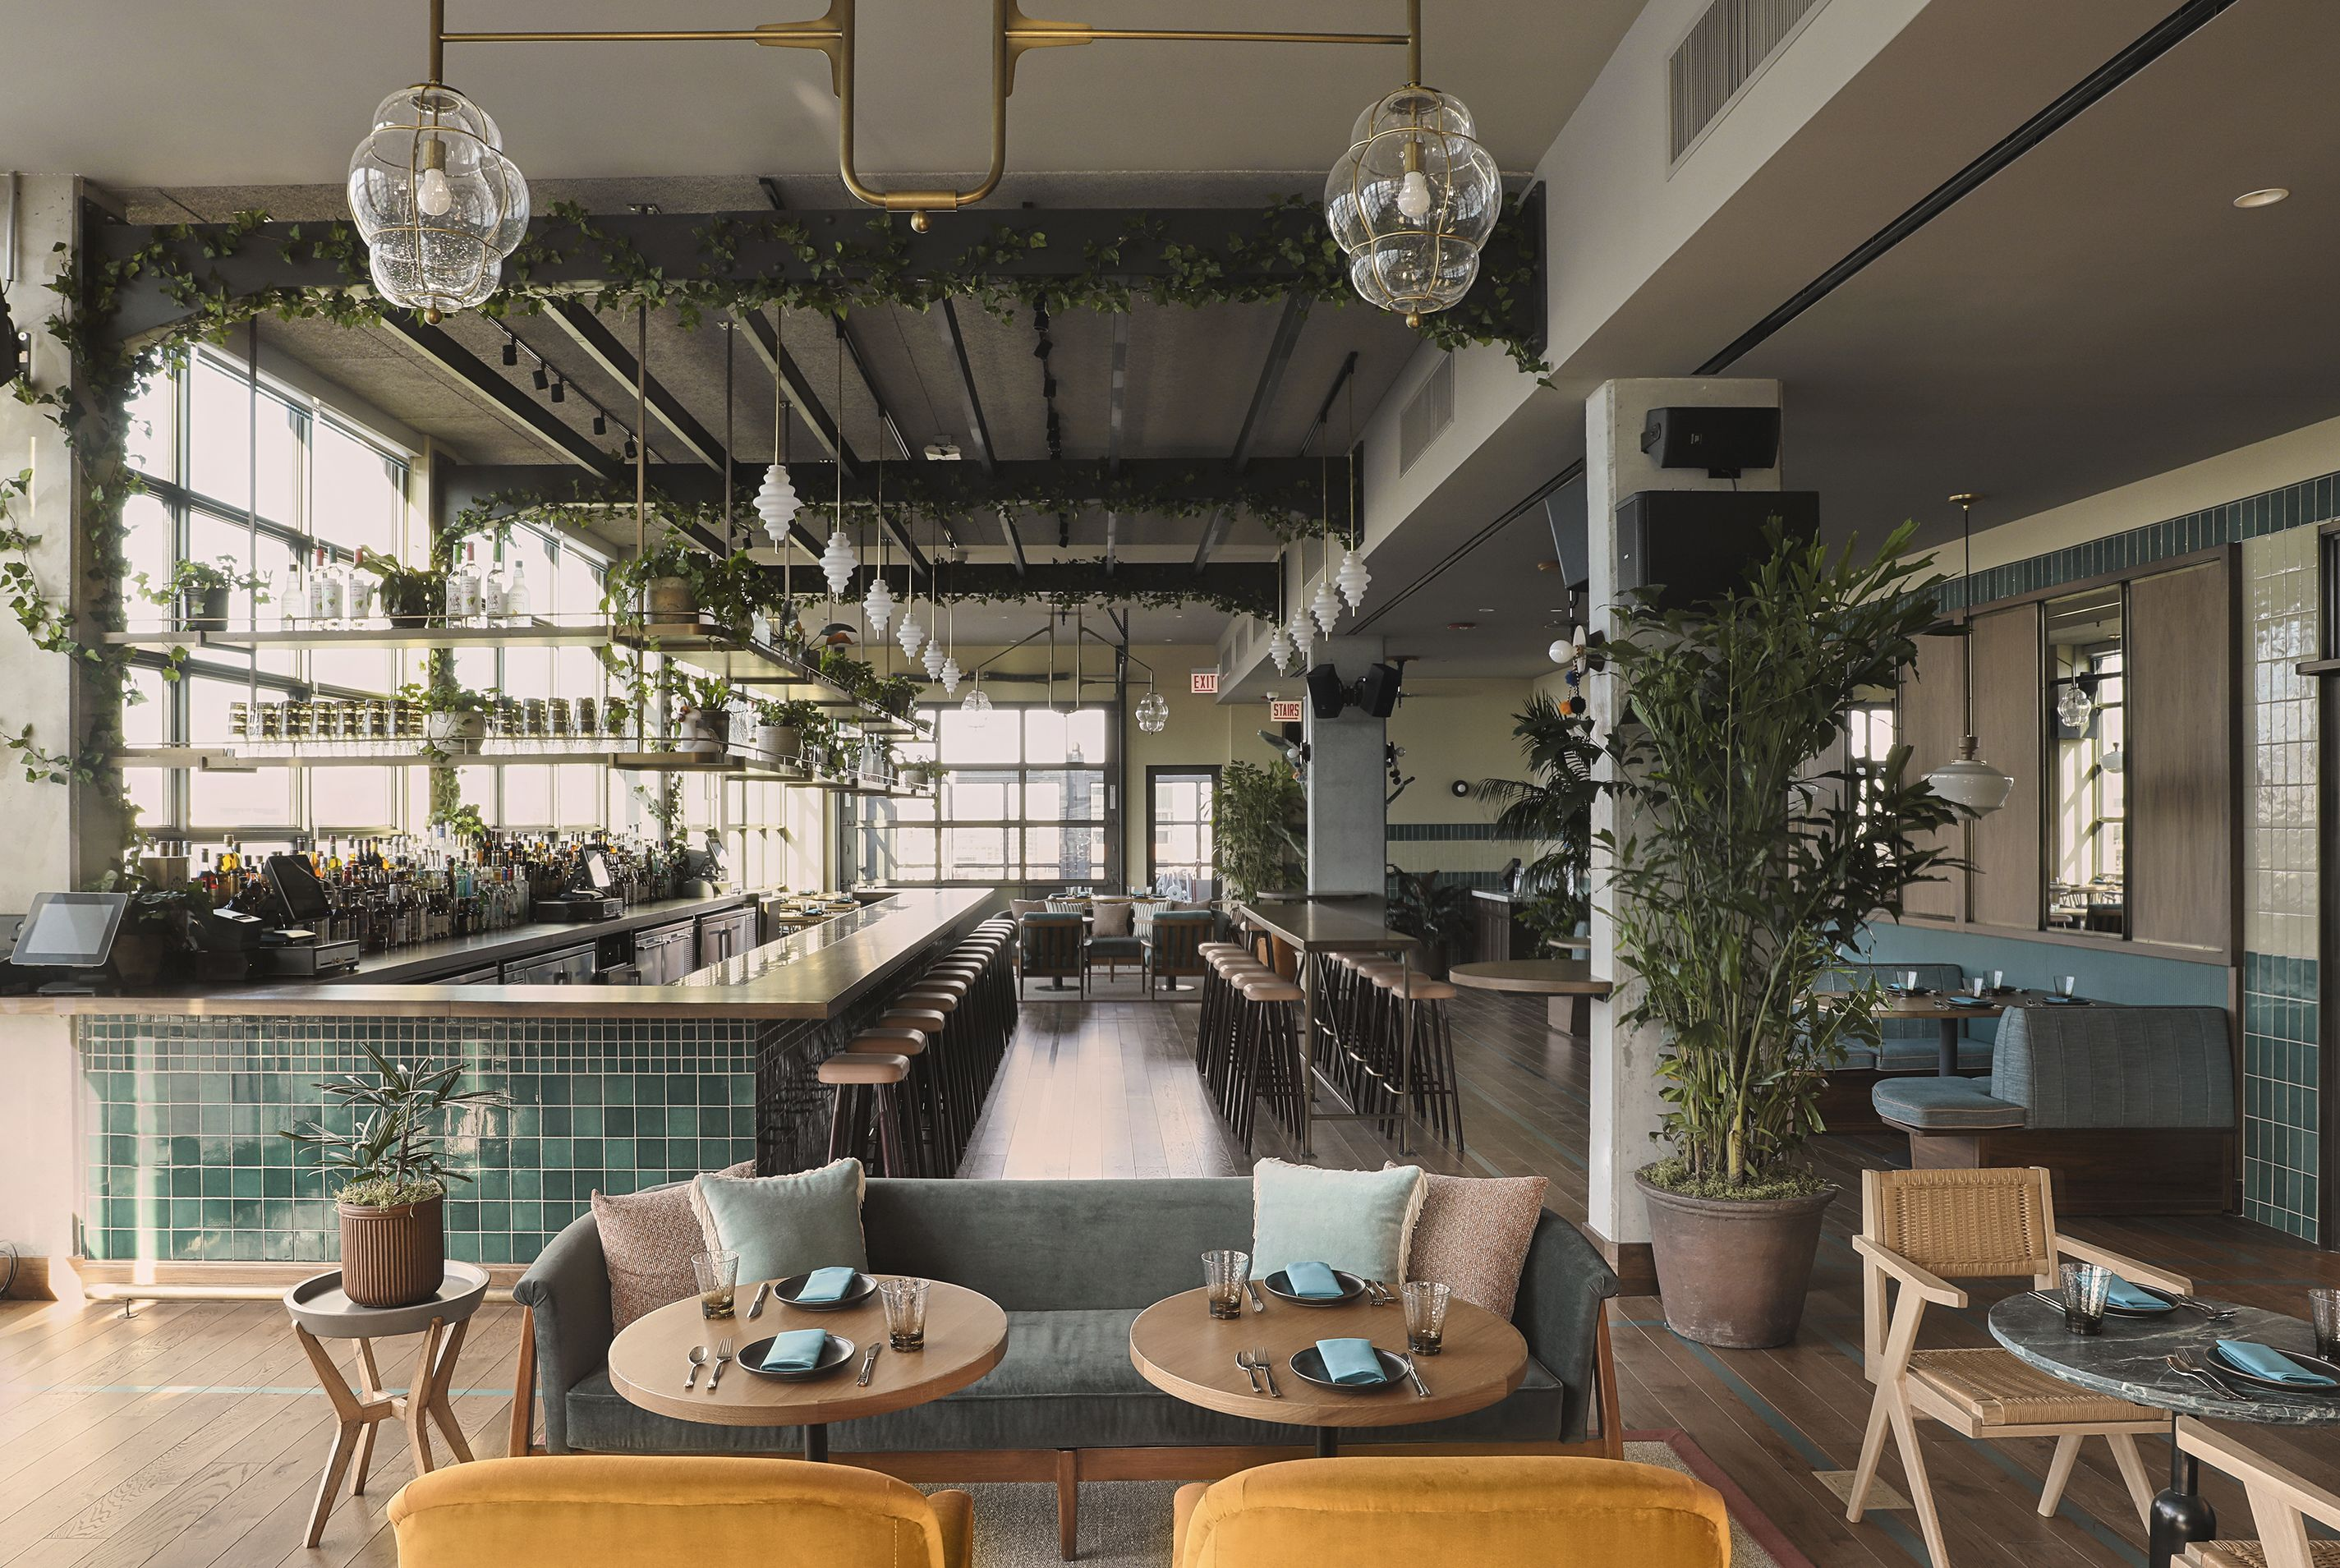 Boutique hoxton hotel makes its fulton market debut